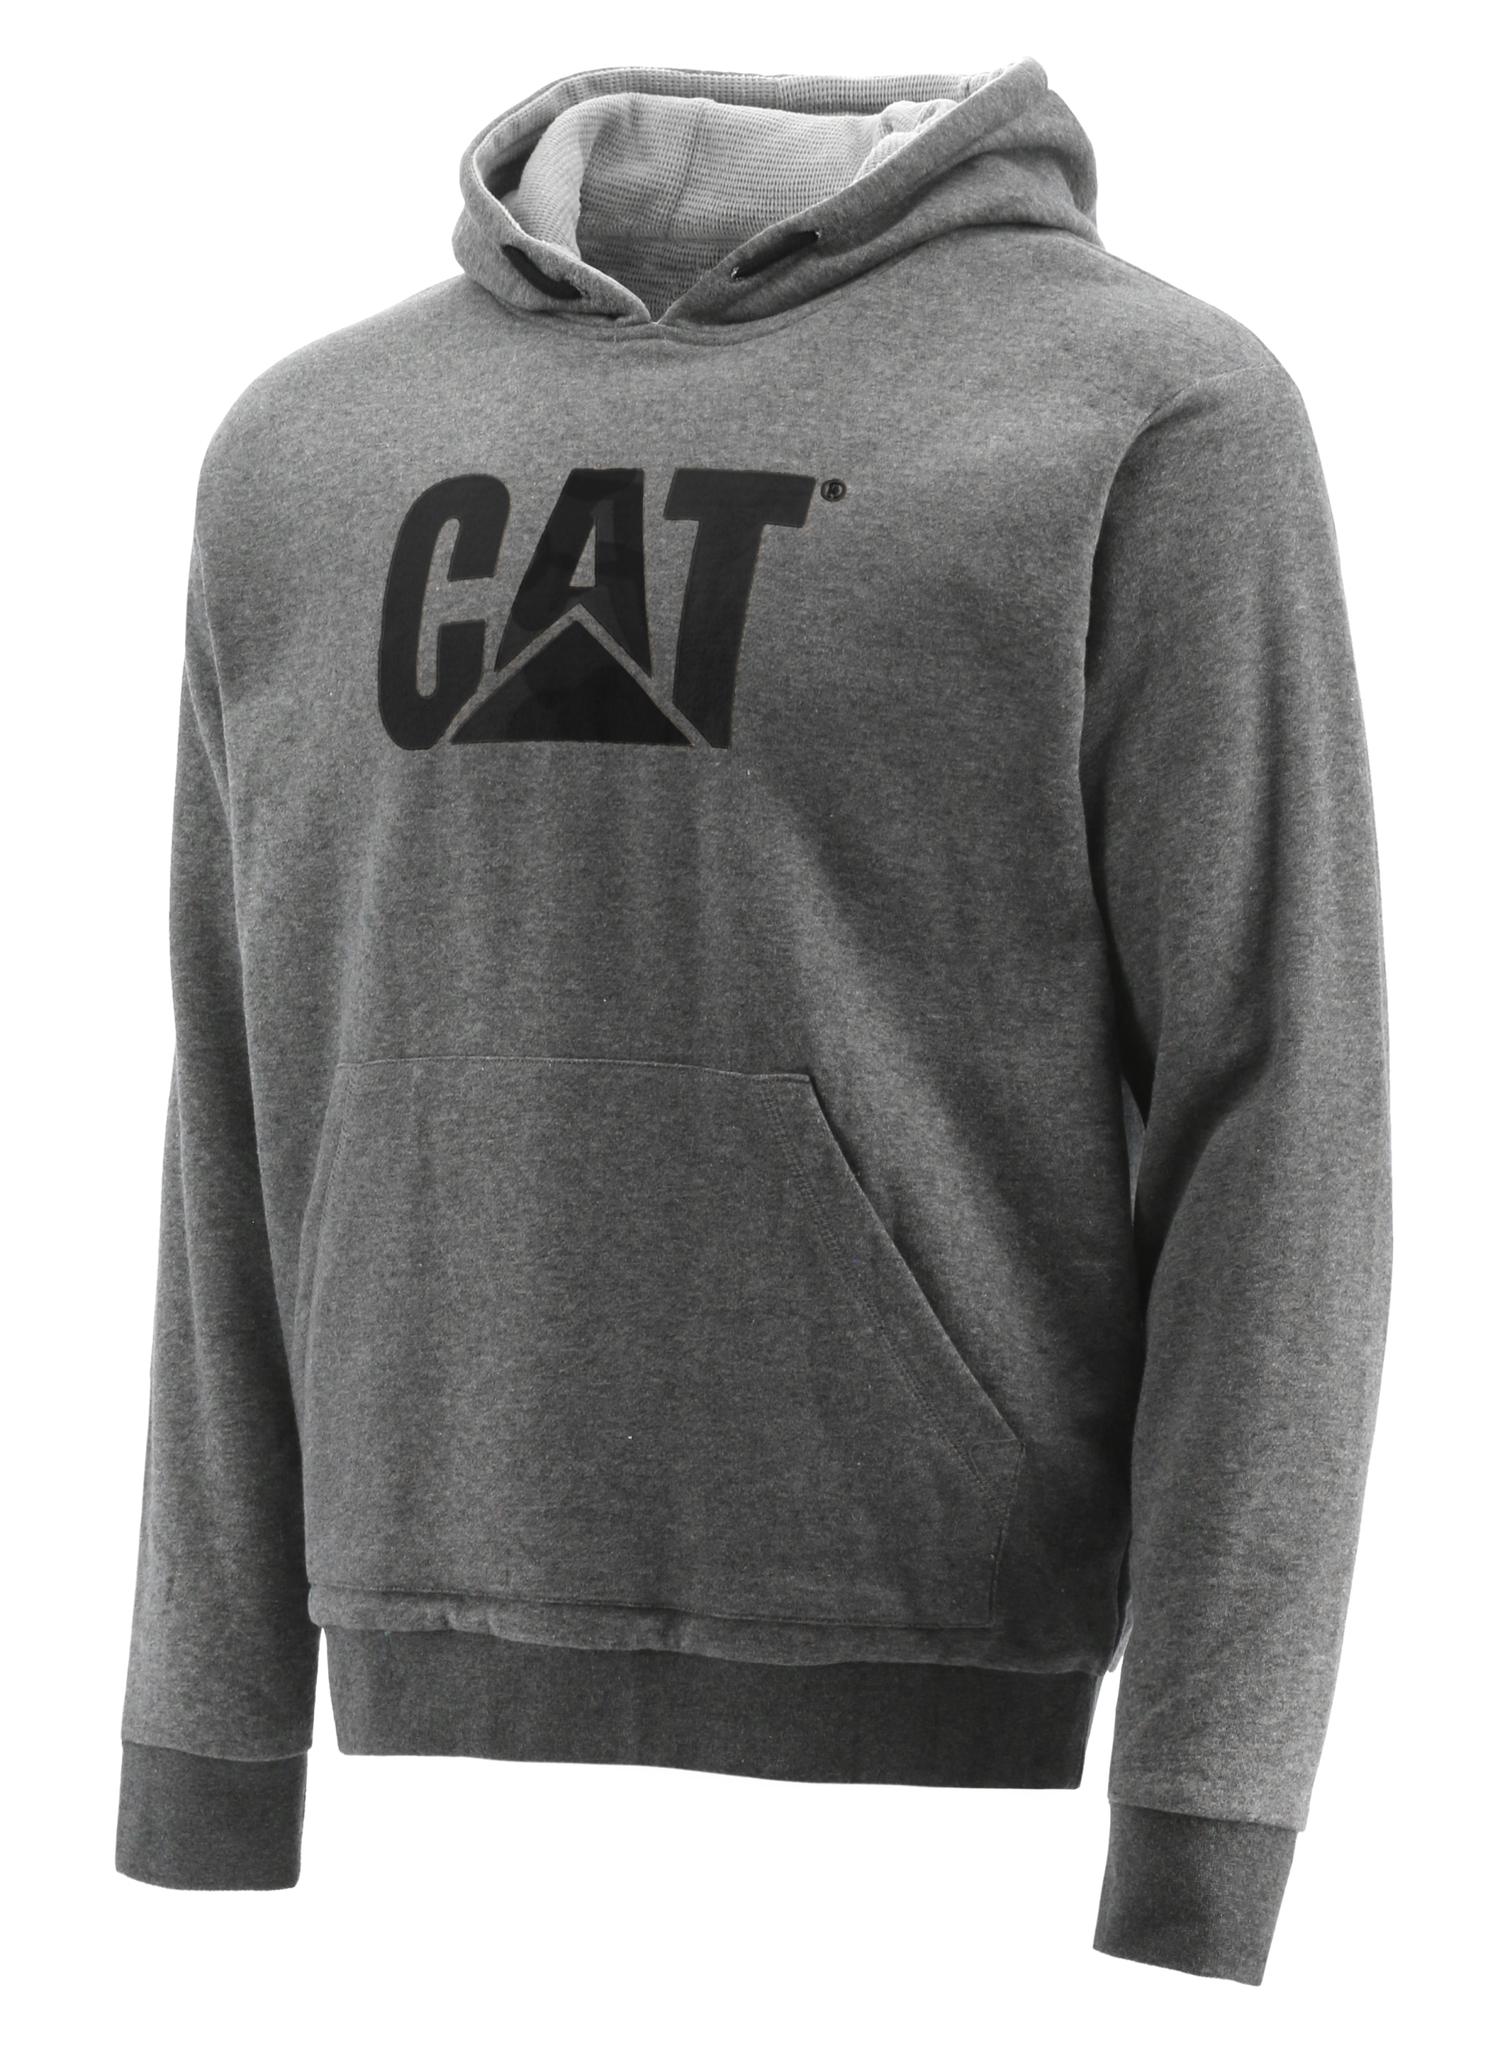 CAT Caterpillar Concord Fleece Pullover Mens Durable Lined Work Jumper